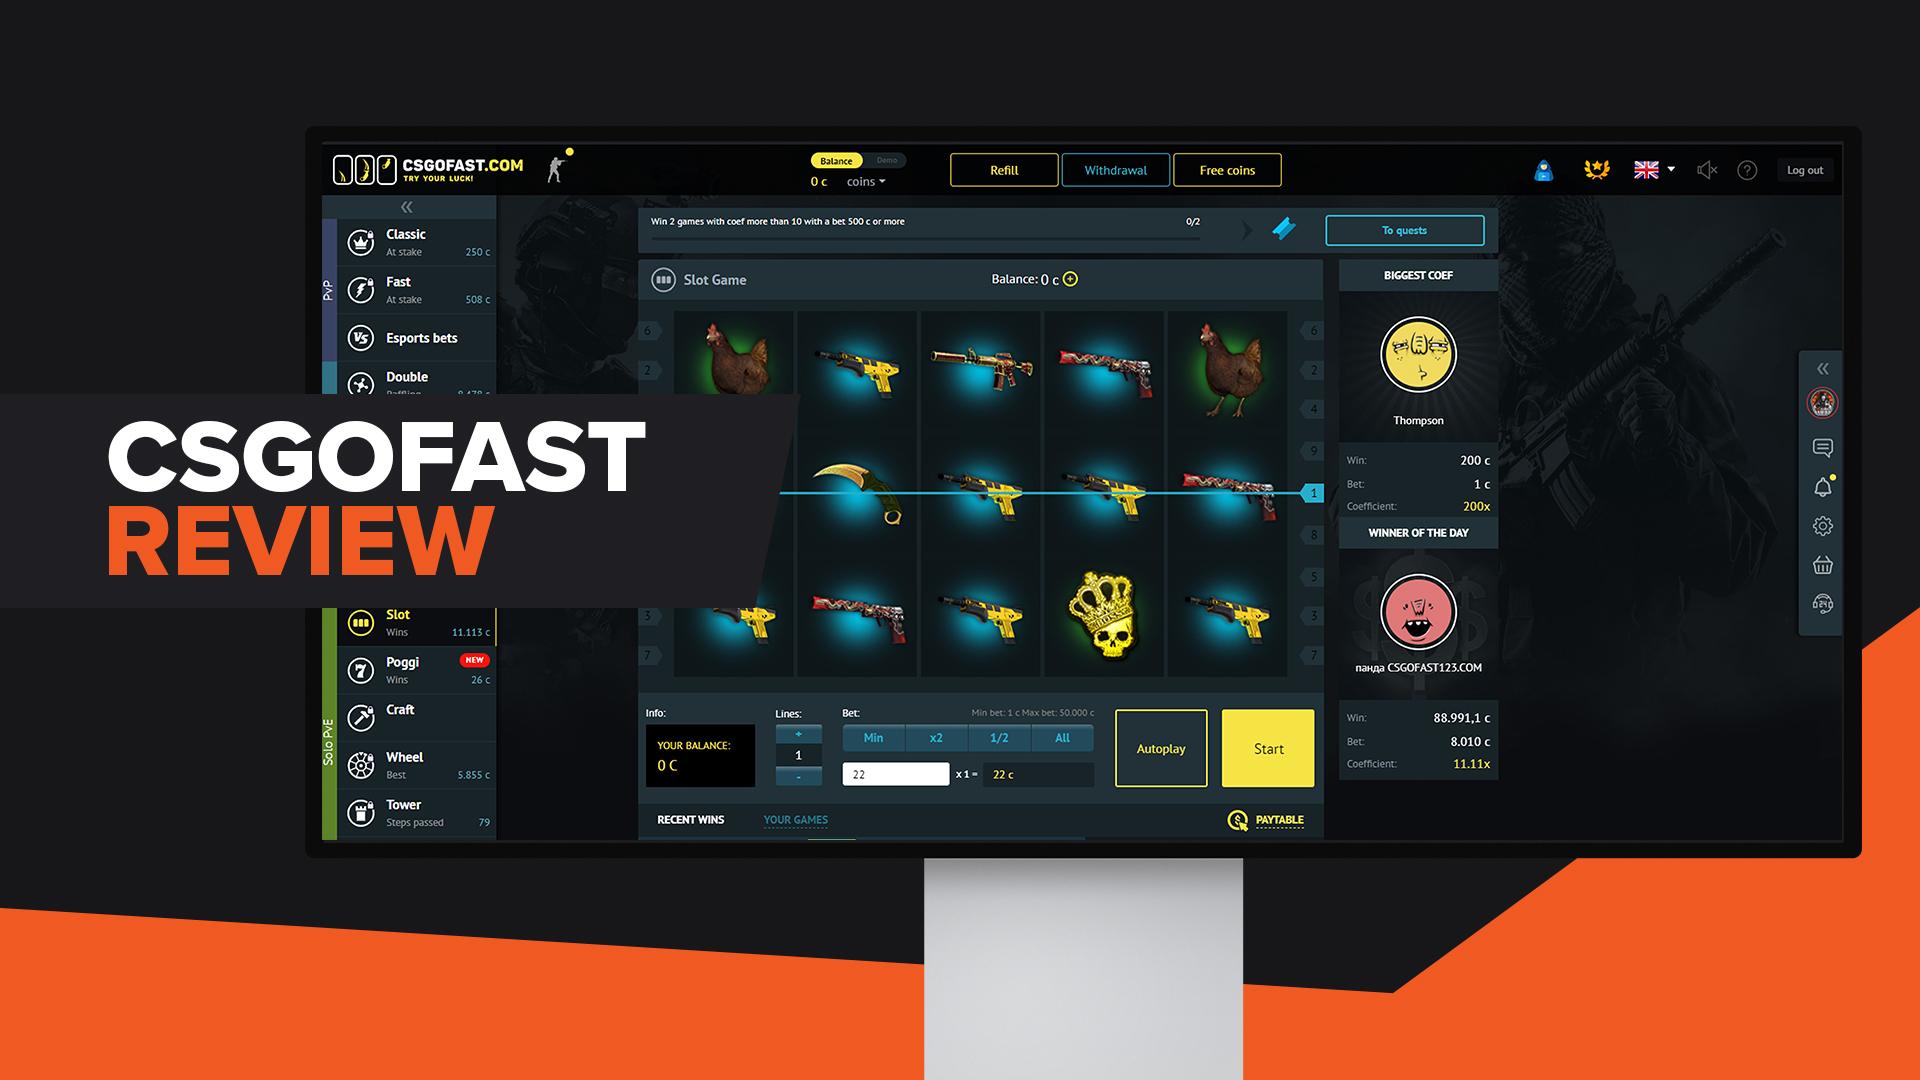 CSGO Gambling Sites CSGOFast